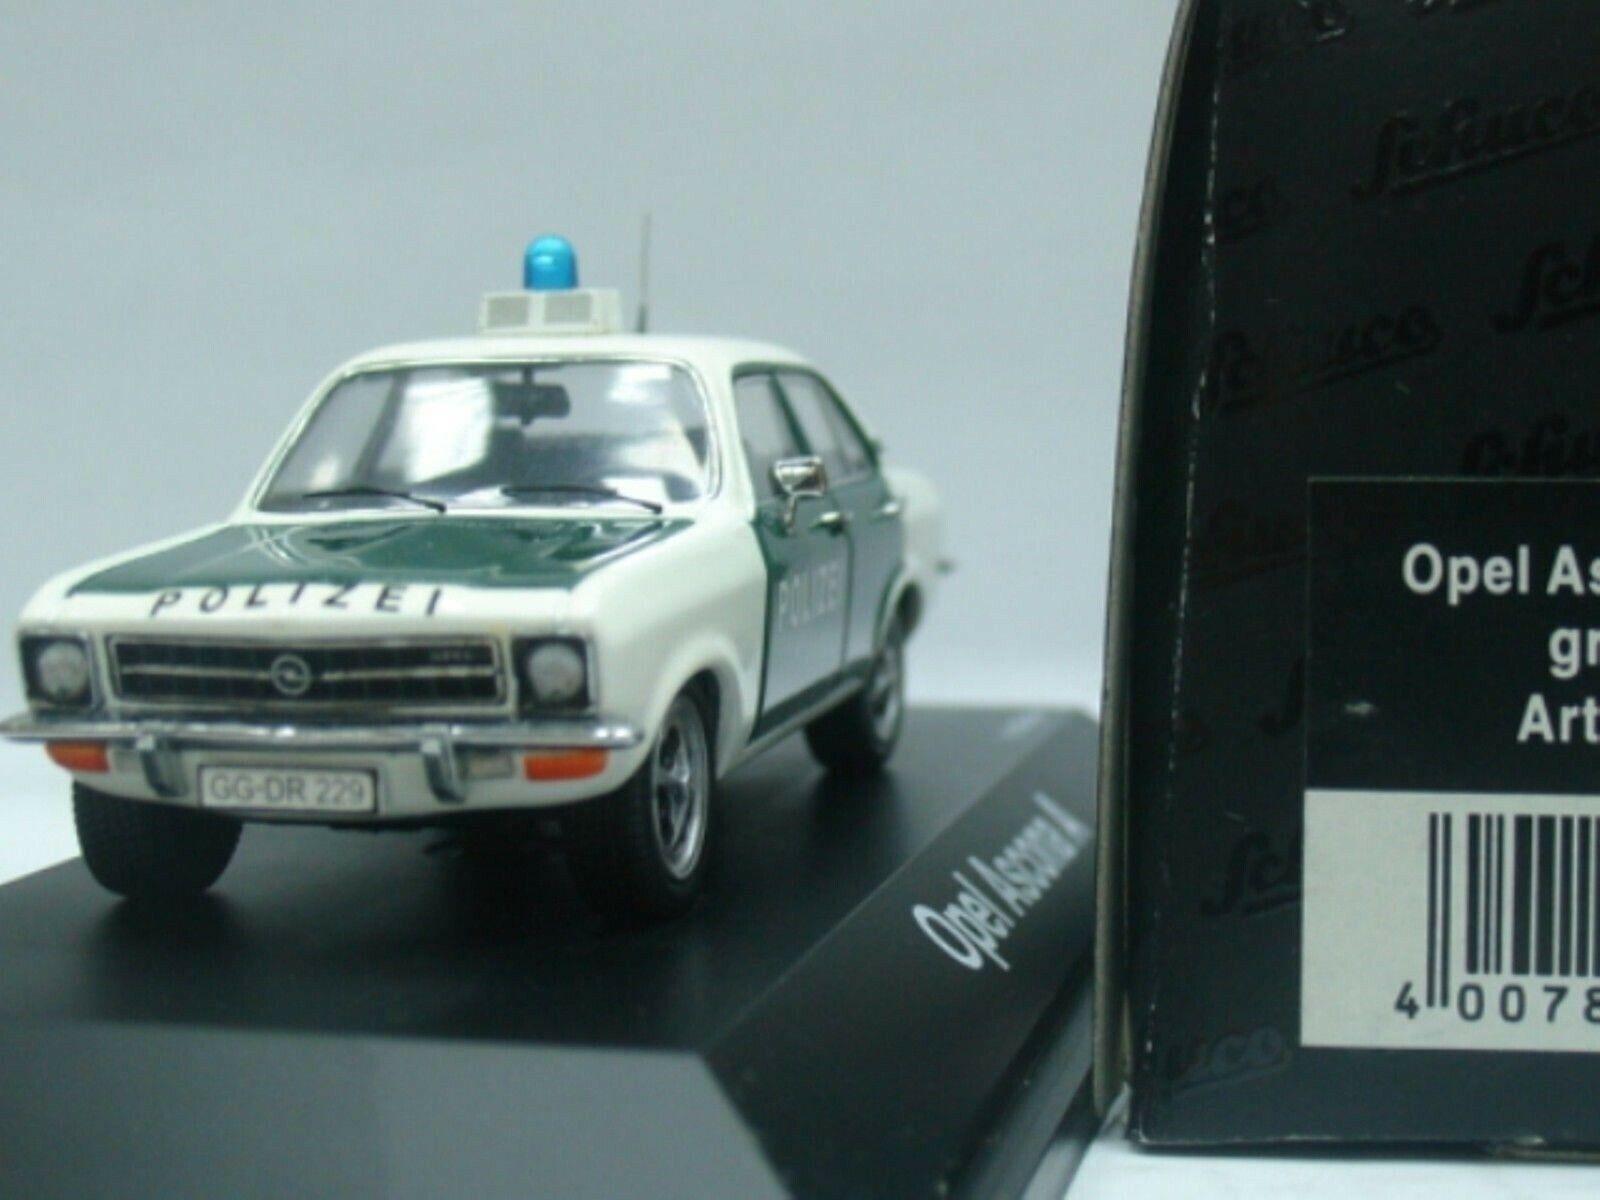 Wow extrêmement rare OPEL ASCONA A 1.6SR 1974 GG Polizei 1 43 Schuco-MINICHAMPS